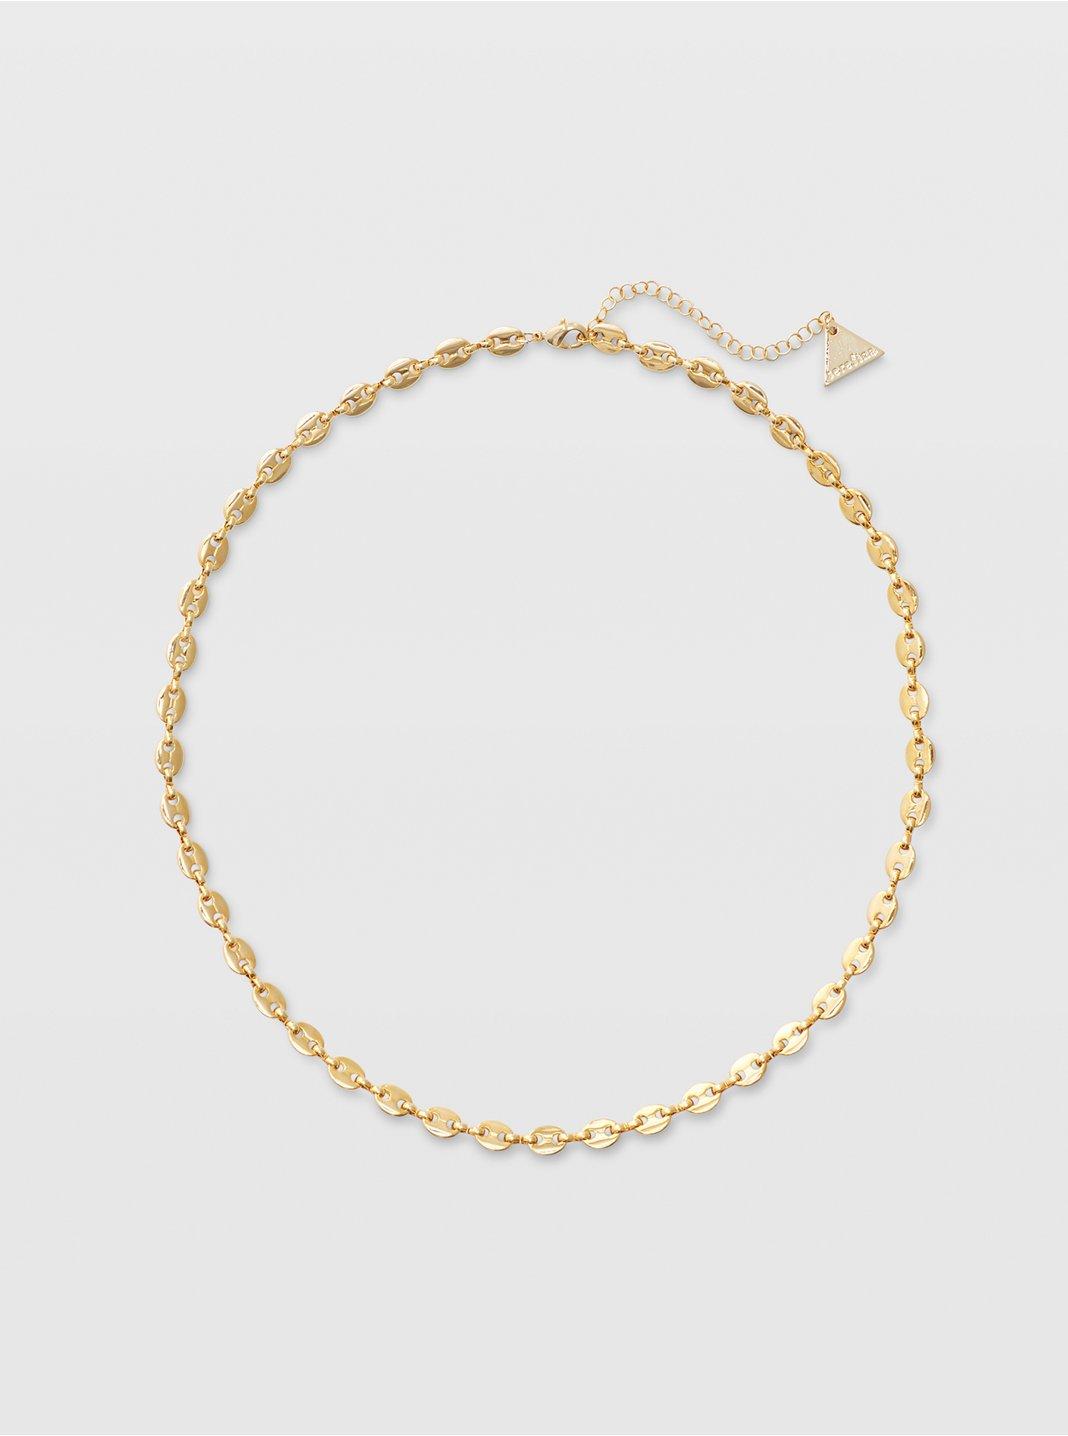 Serefina Short Chain Necklace